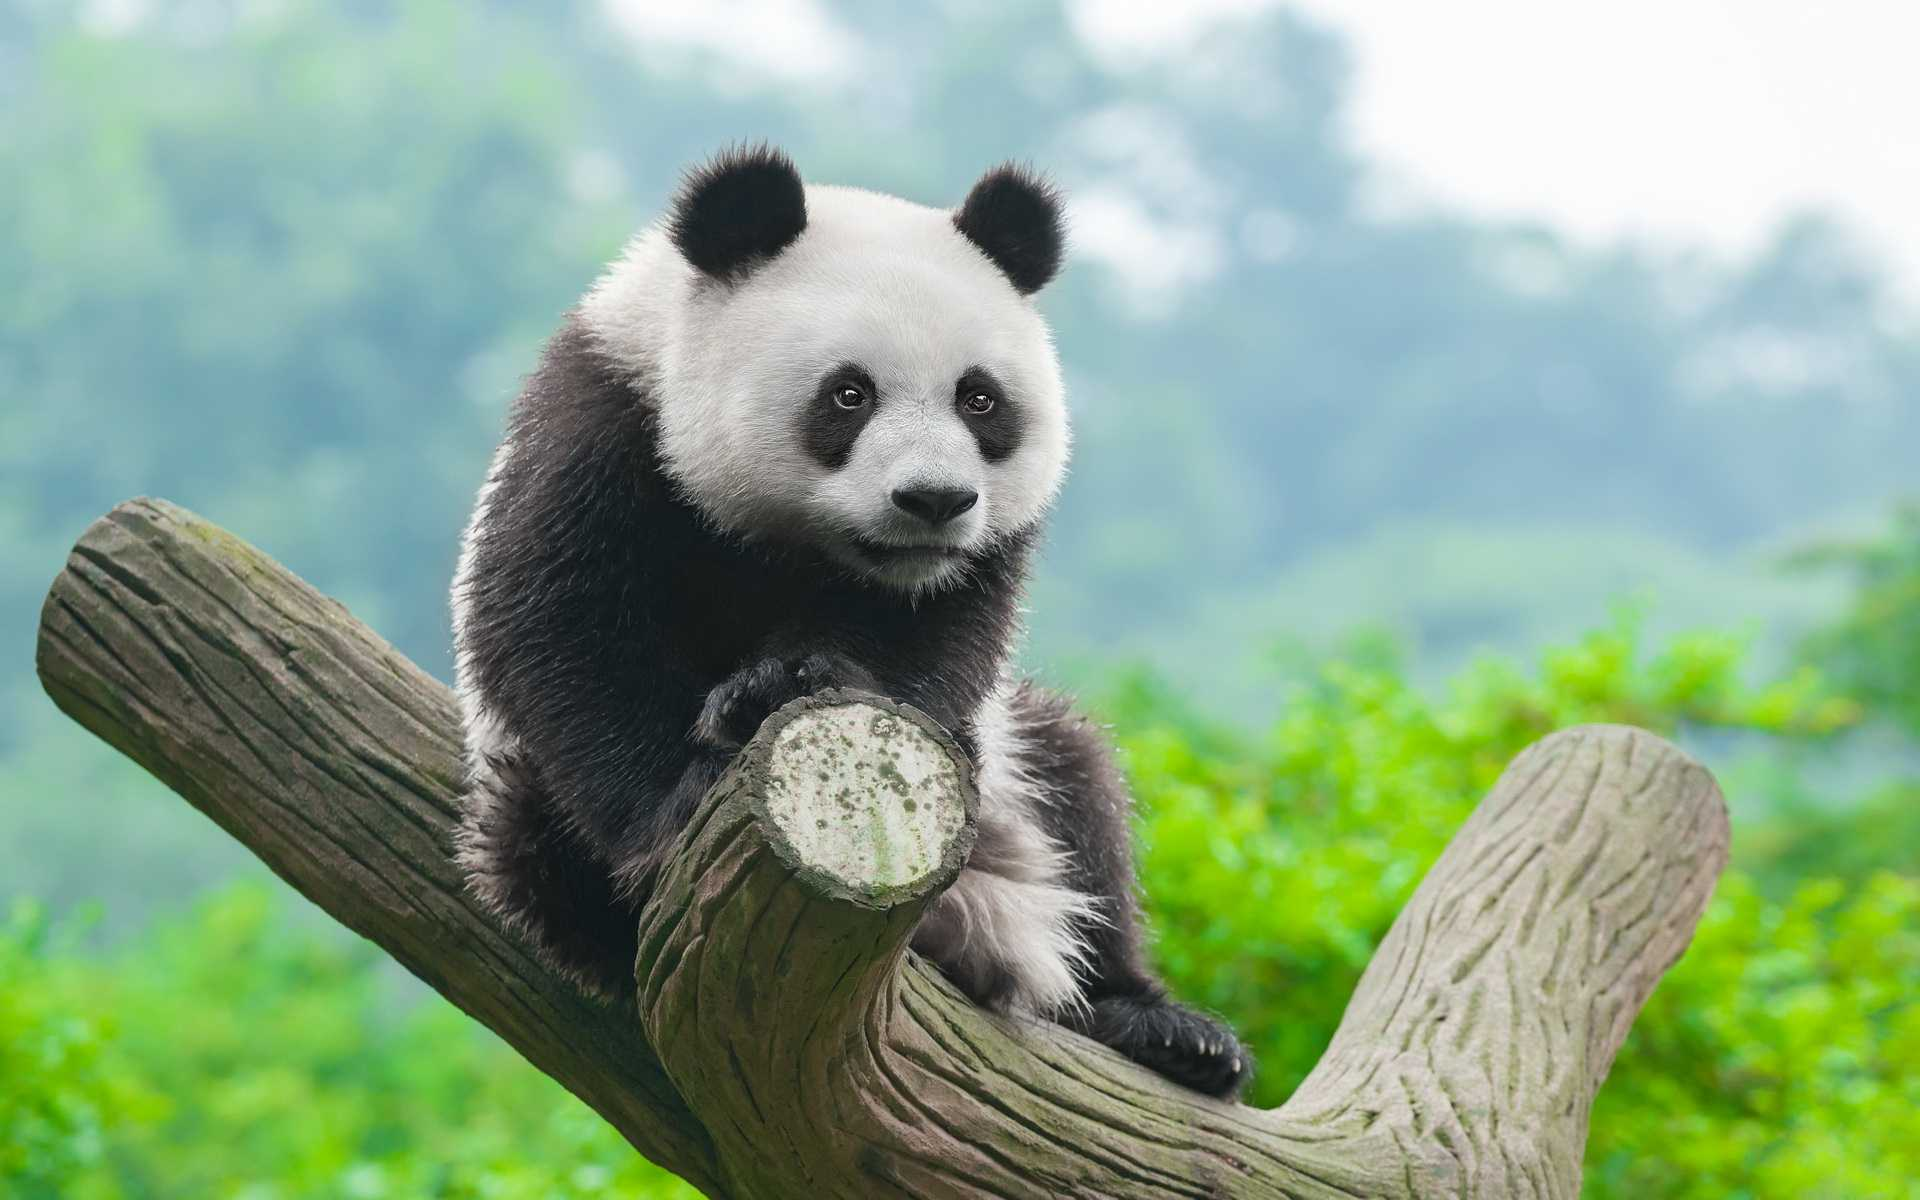 Cute Baby Panda Bear Wallpaper High Definition Iphone In Snow Cute 1920x1200